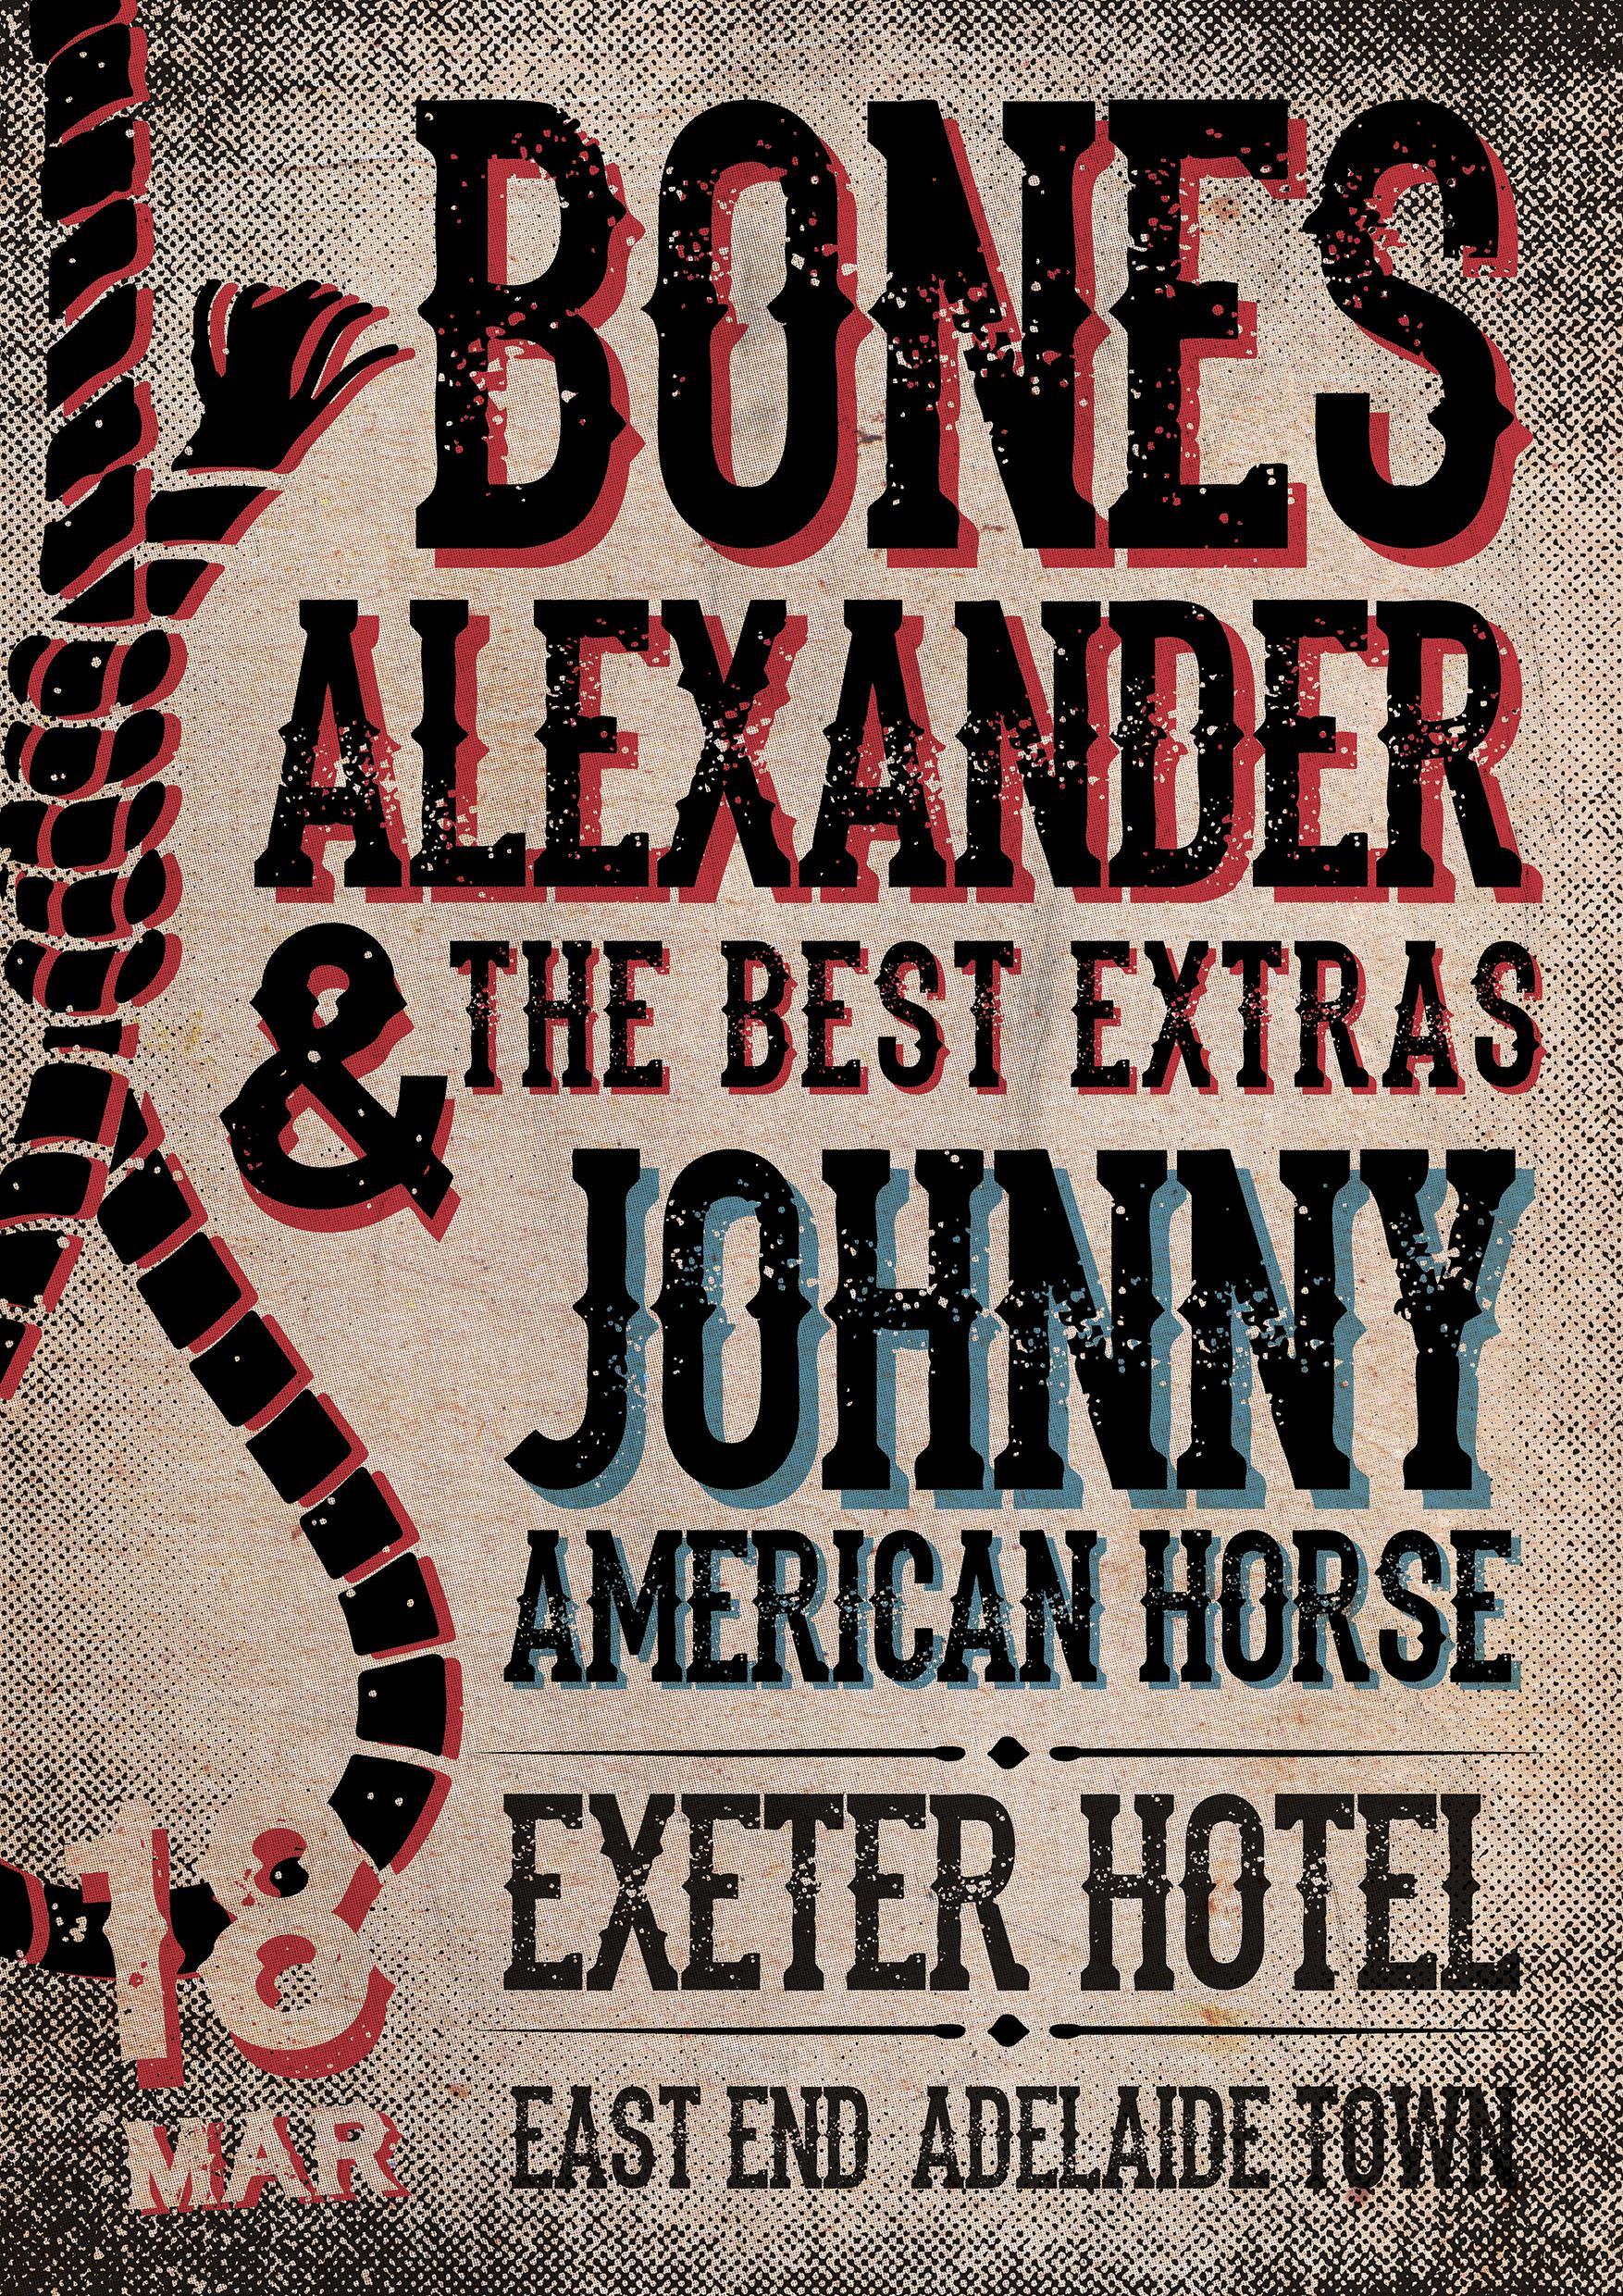 poster-exeter-hotel-ADL-18032017-trb